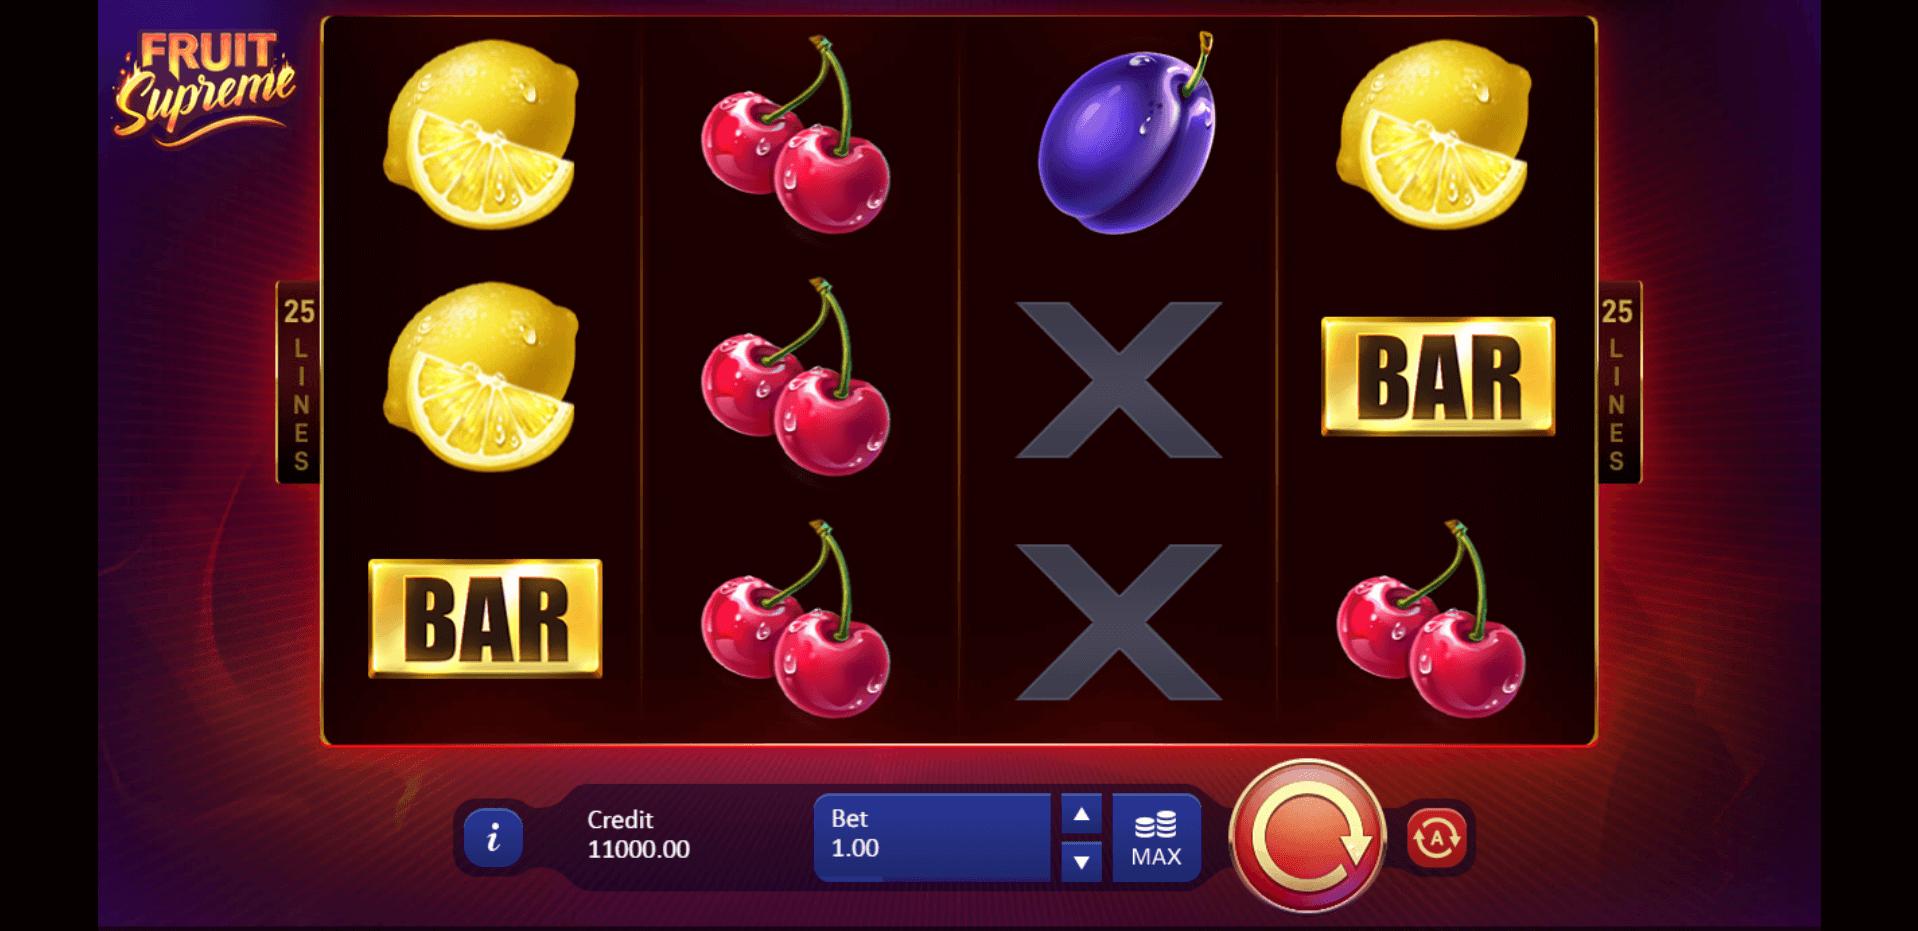 Fruit Supreme slot machine screenshot